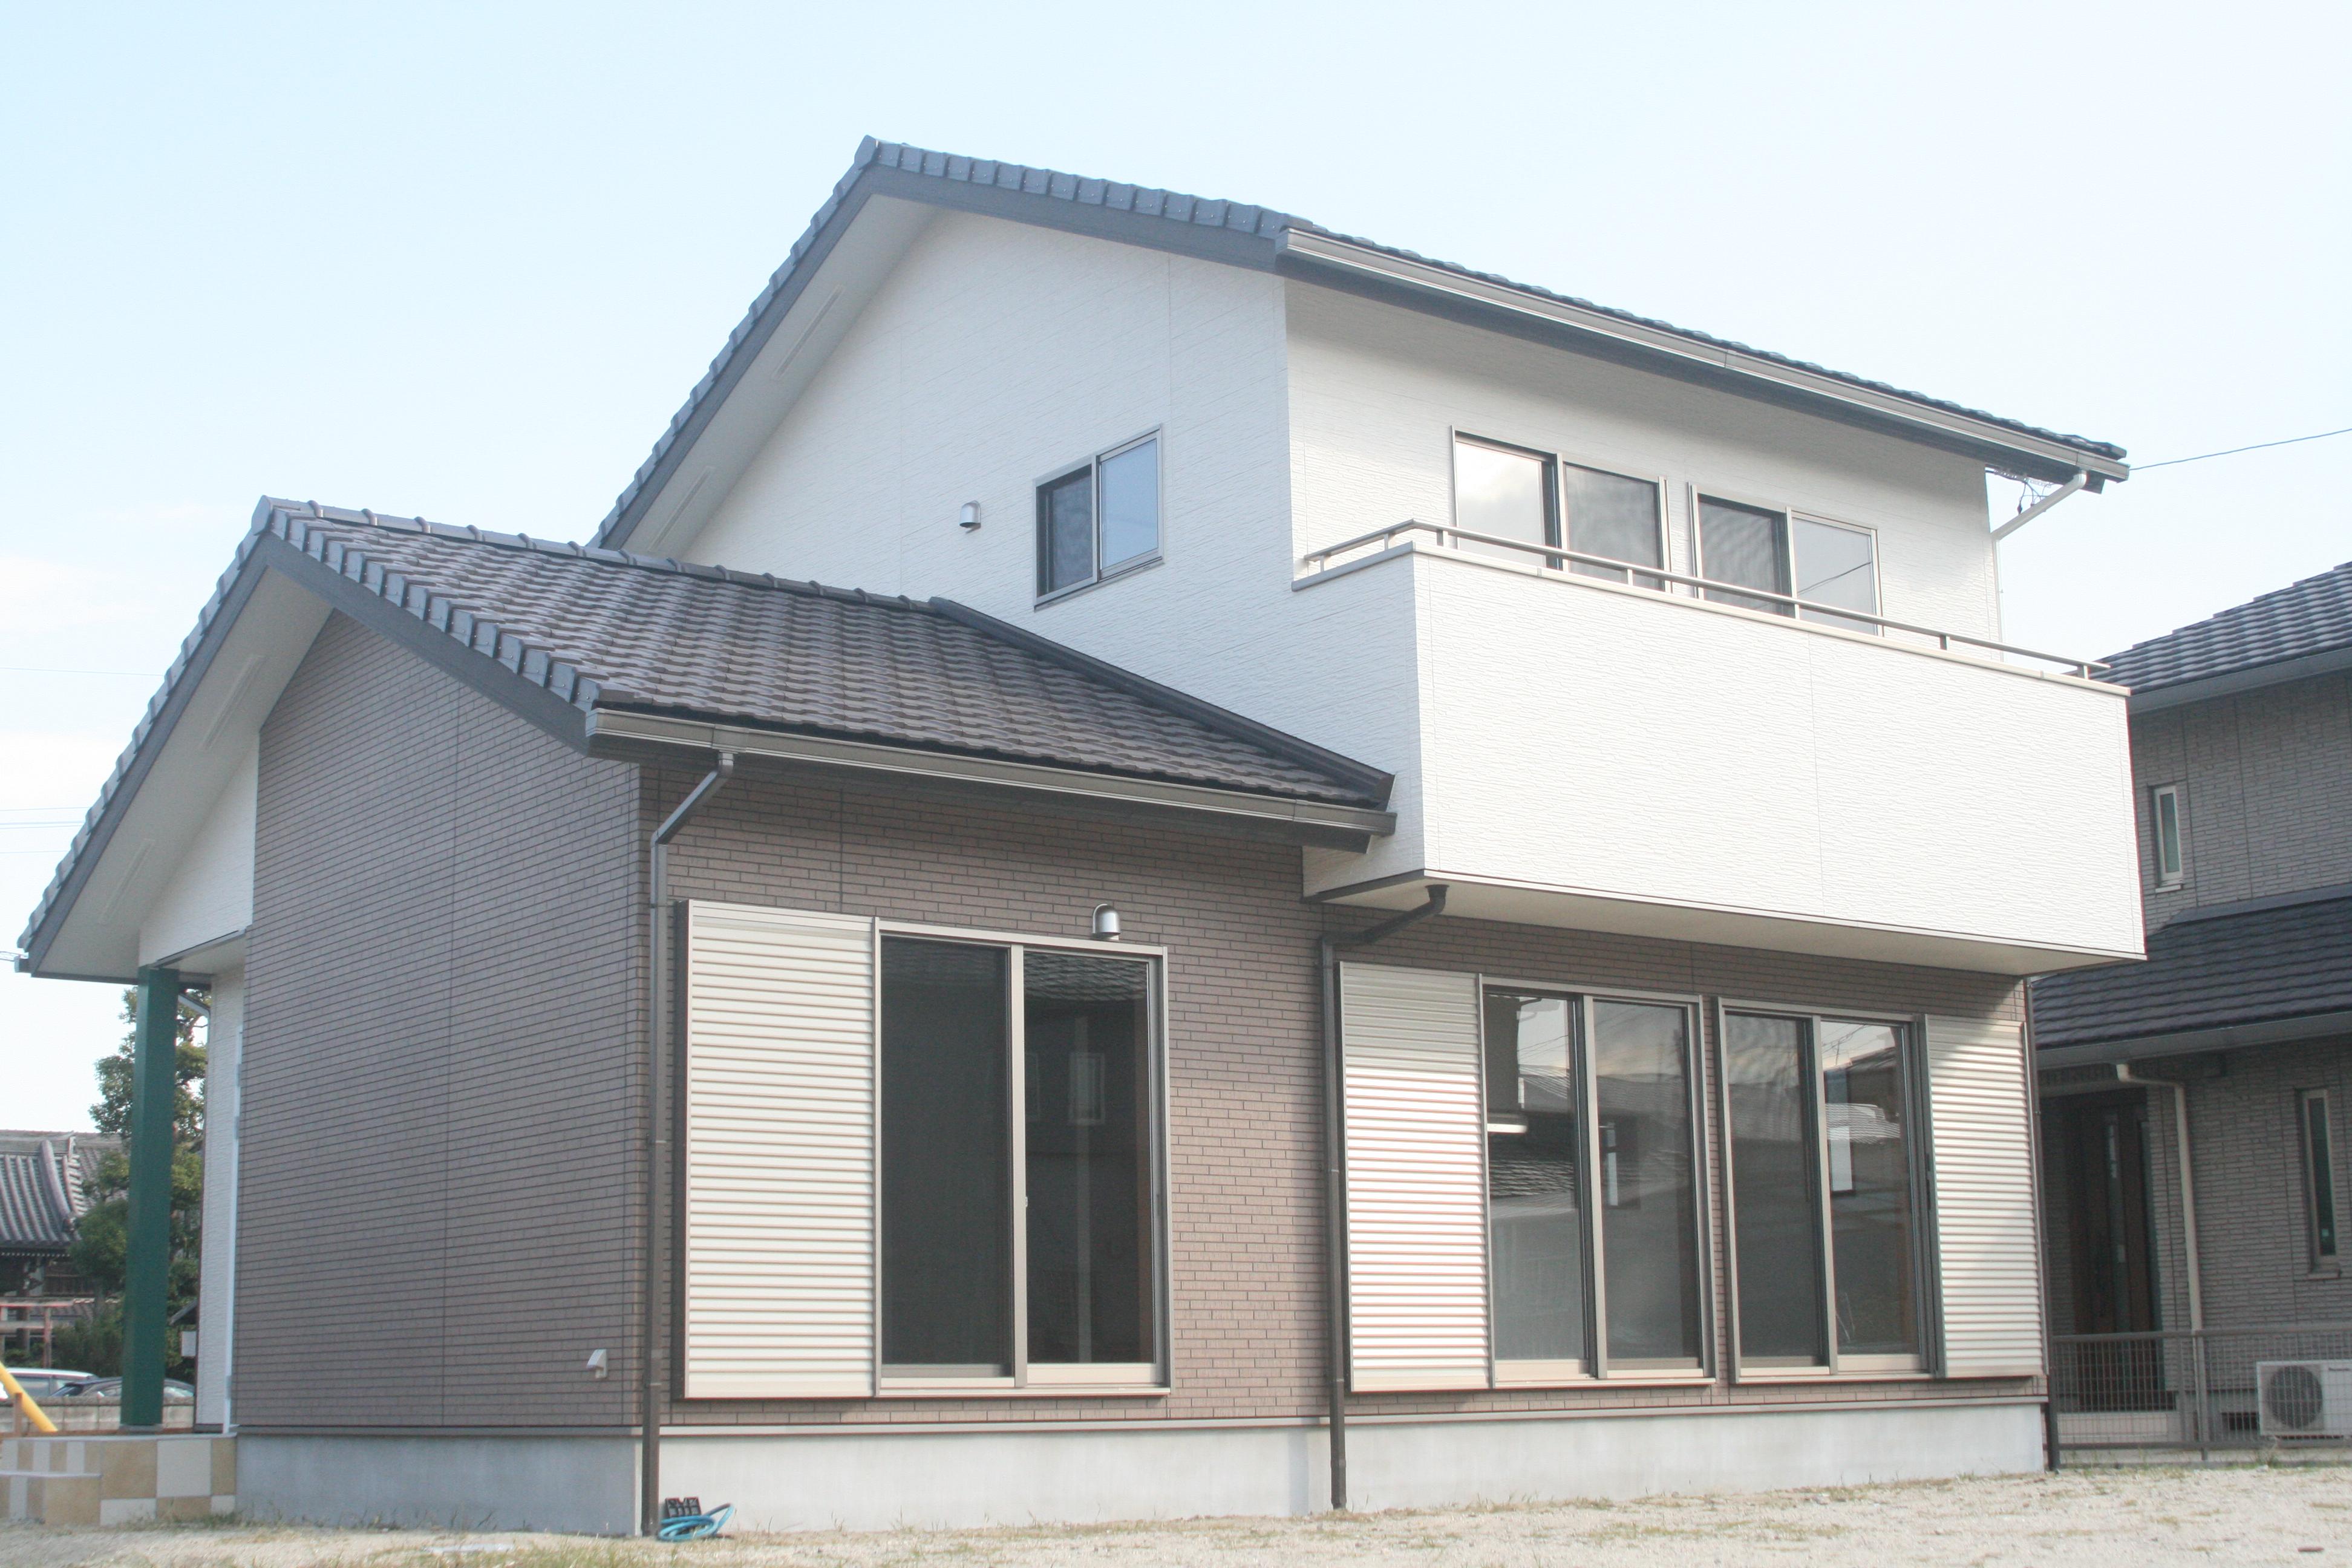 IMG_4525.JPG